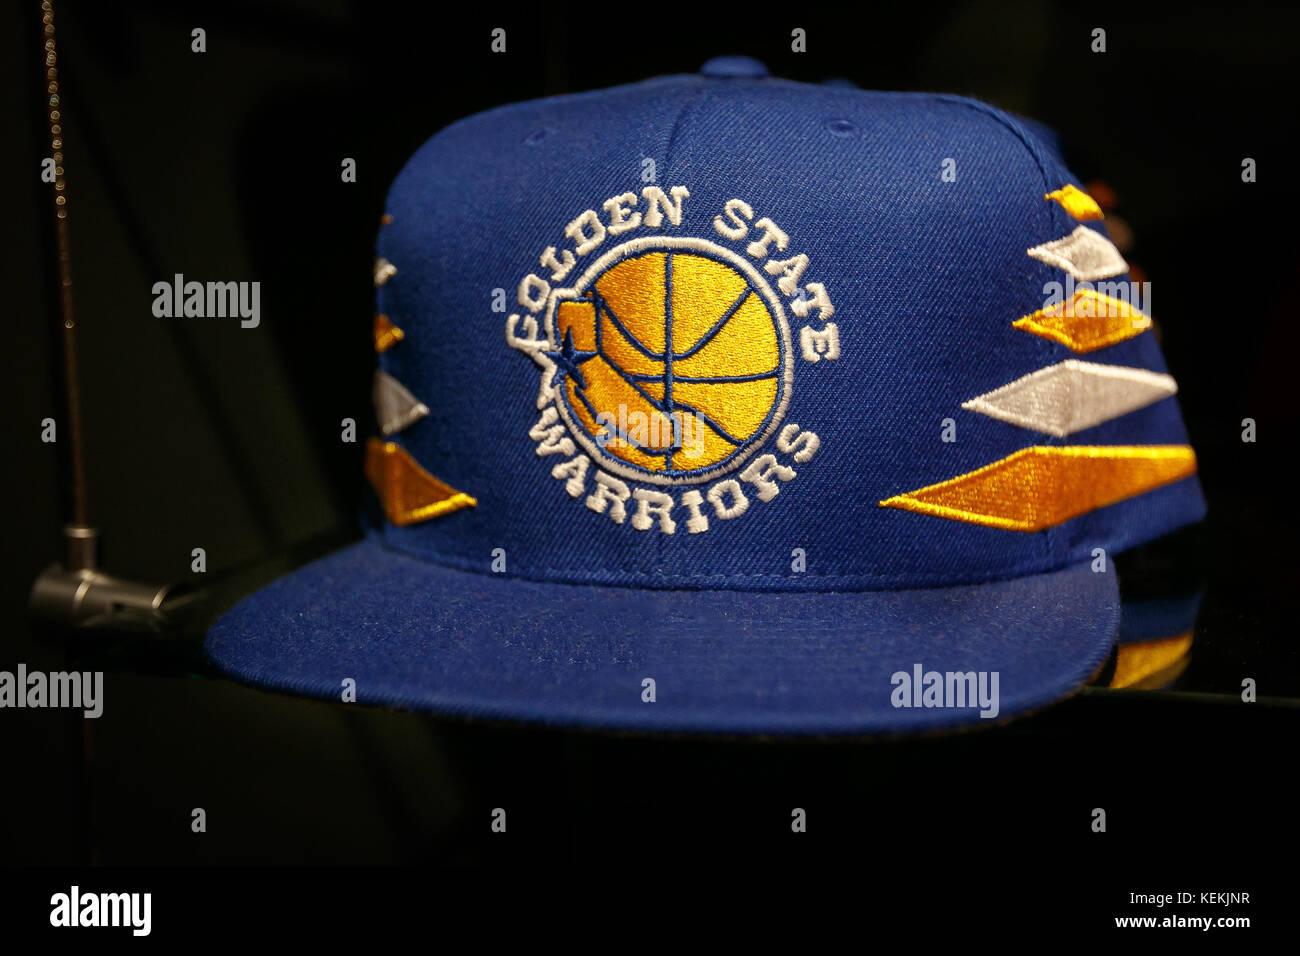 Golden State Warriors hat a la venta en la tienda de la NBA en Manhattan. 5dcbbc2ec6c